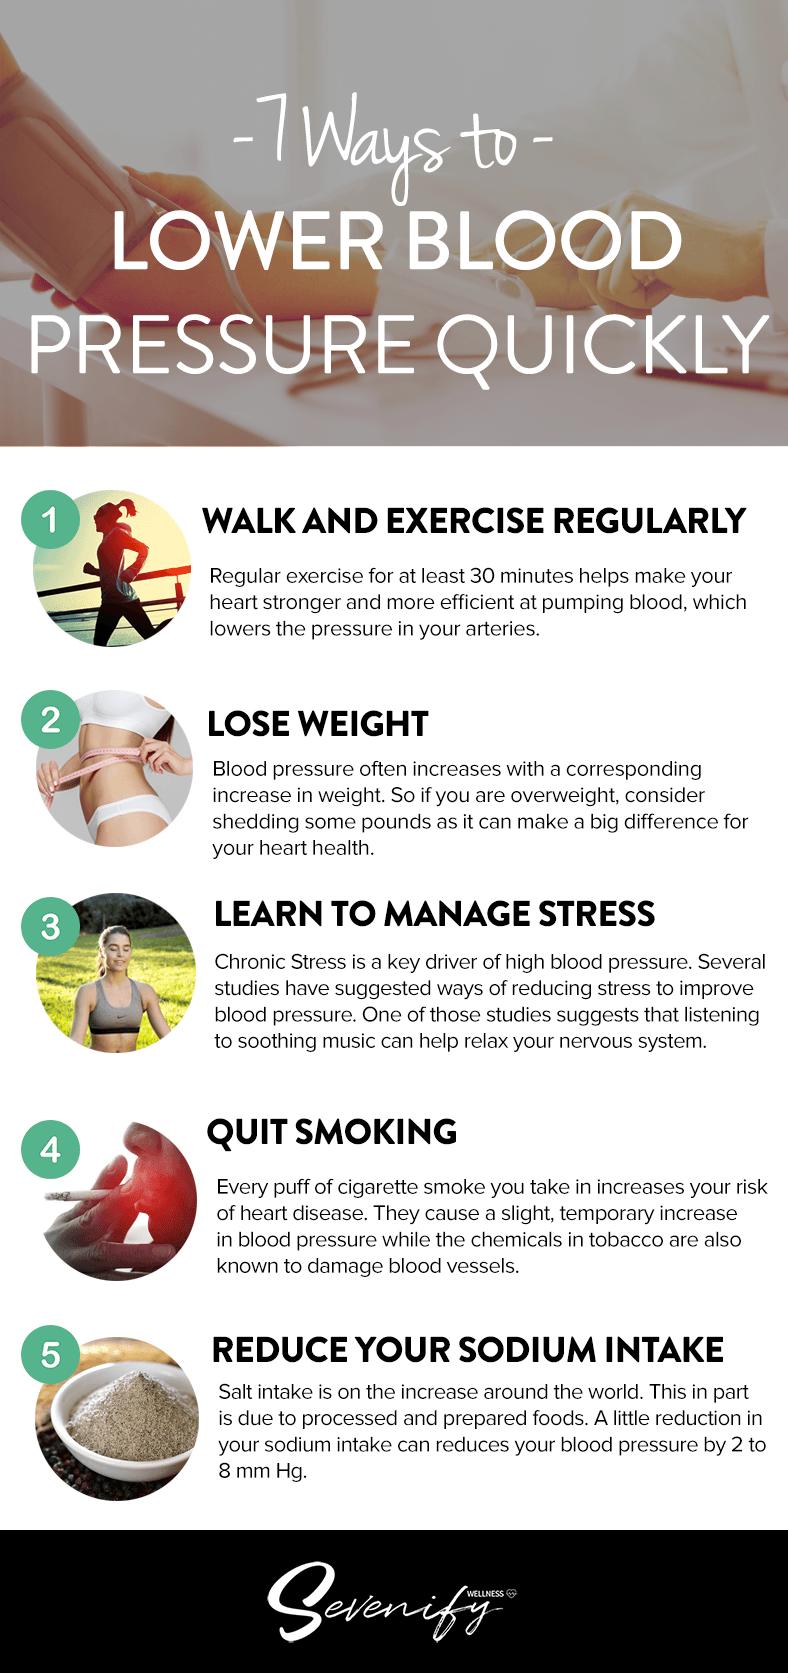 Weight loss through biking image 4